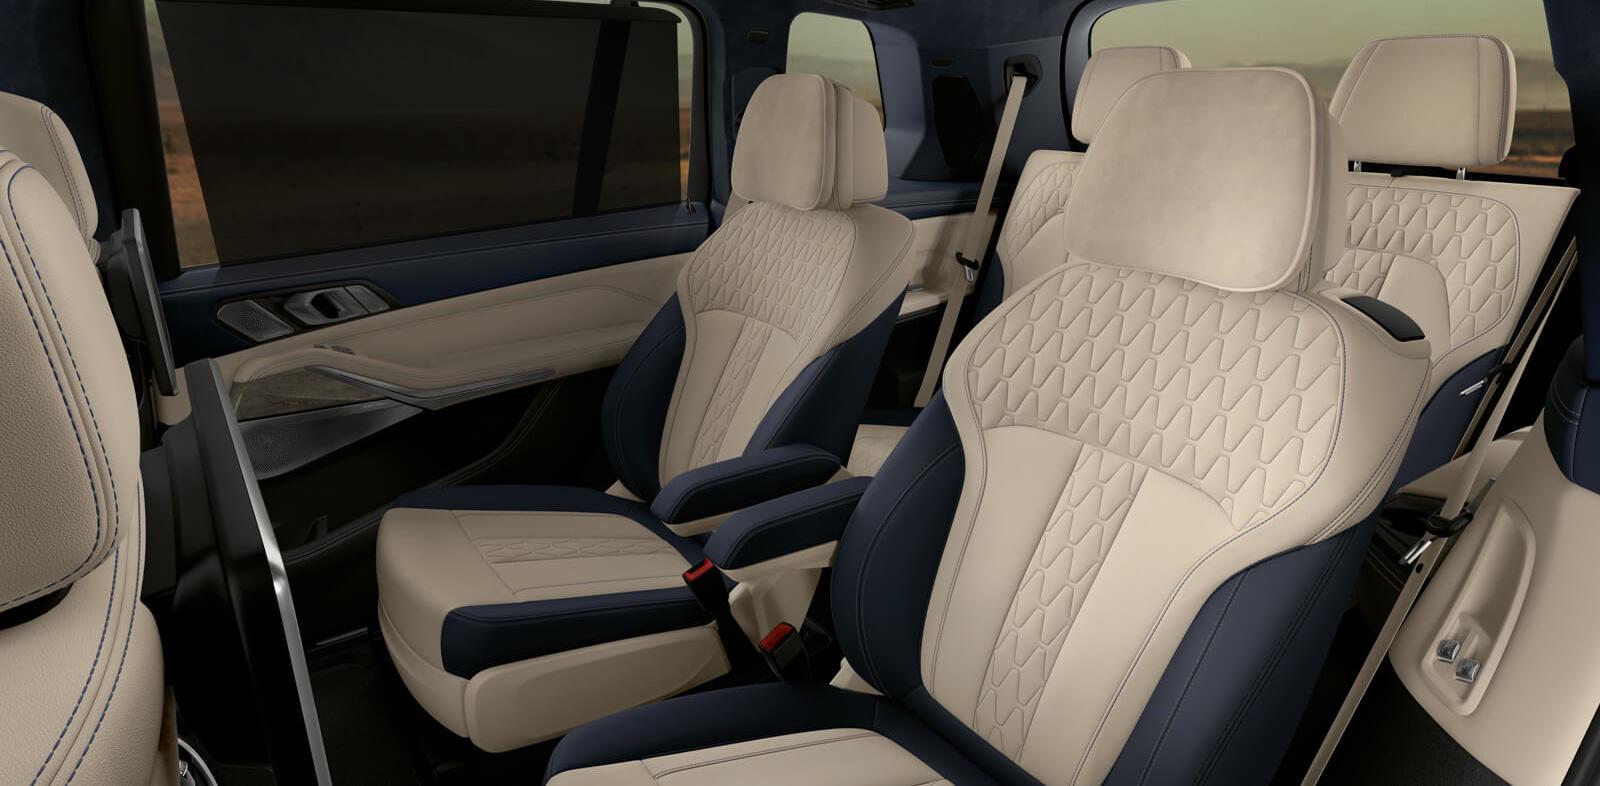 2020 BMW X7 Interior Seating